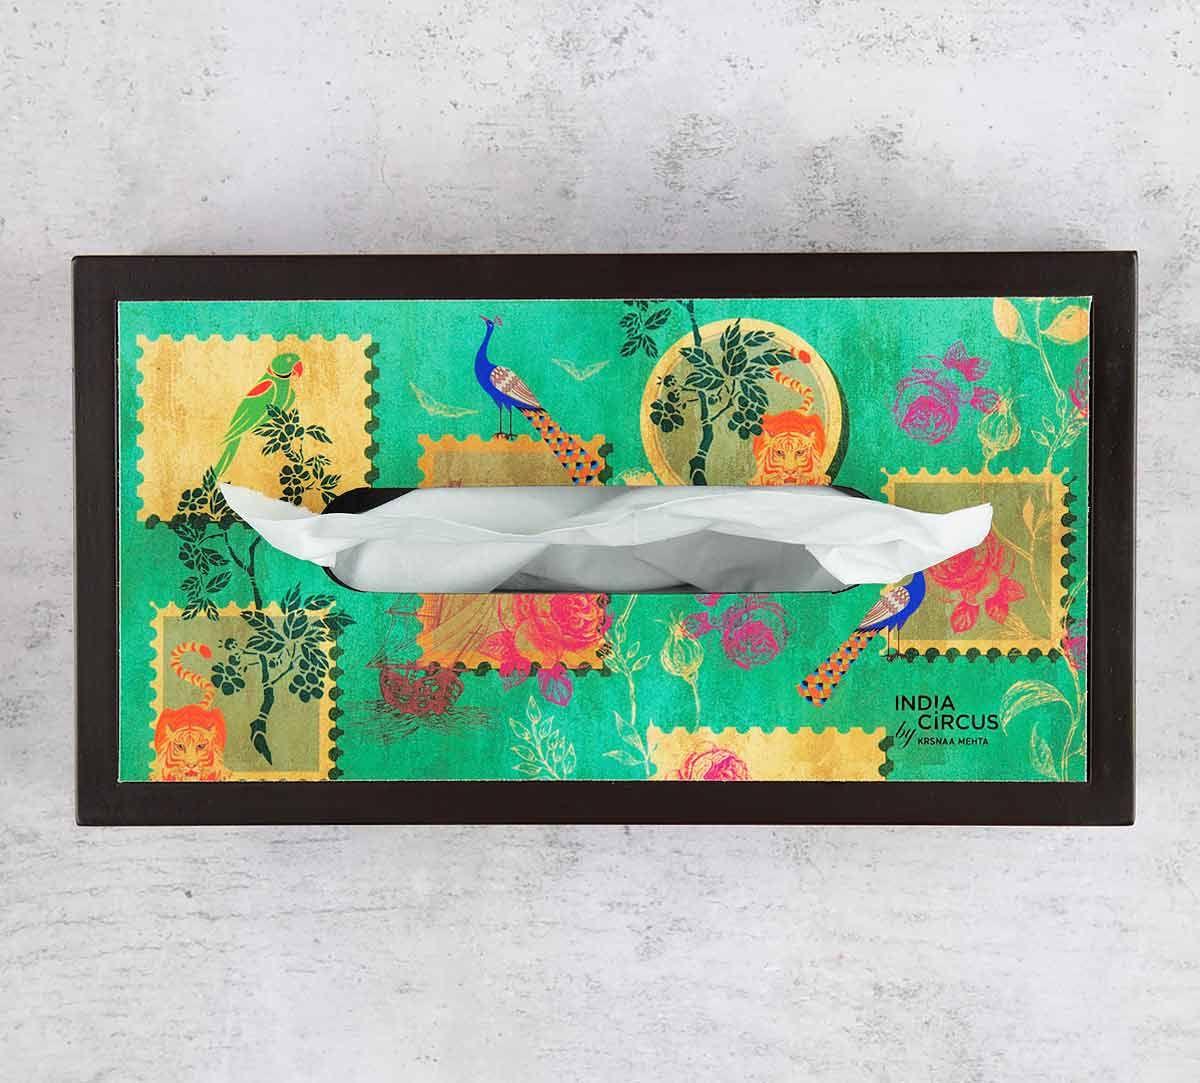 India Circus Wildlife Stamps MDF Tissue Box Holder